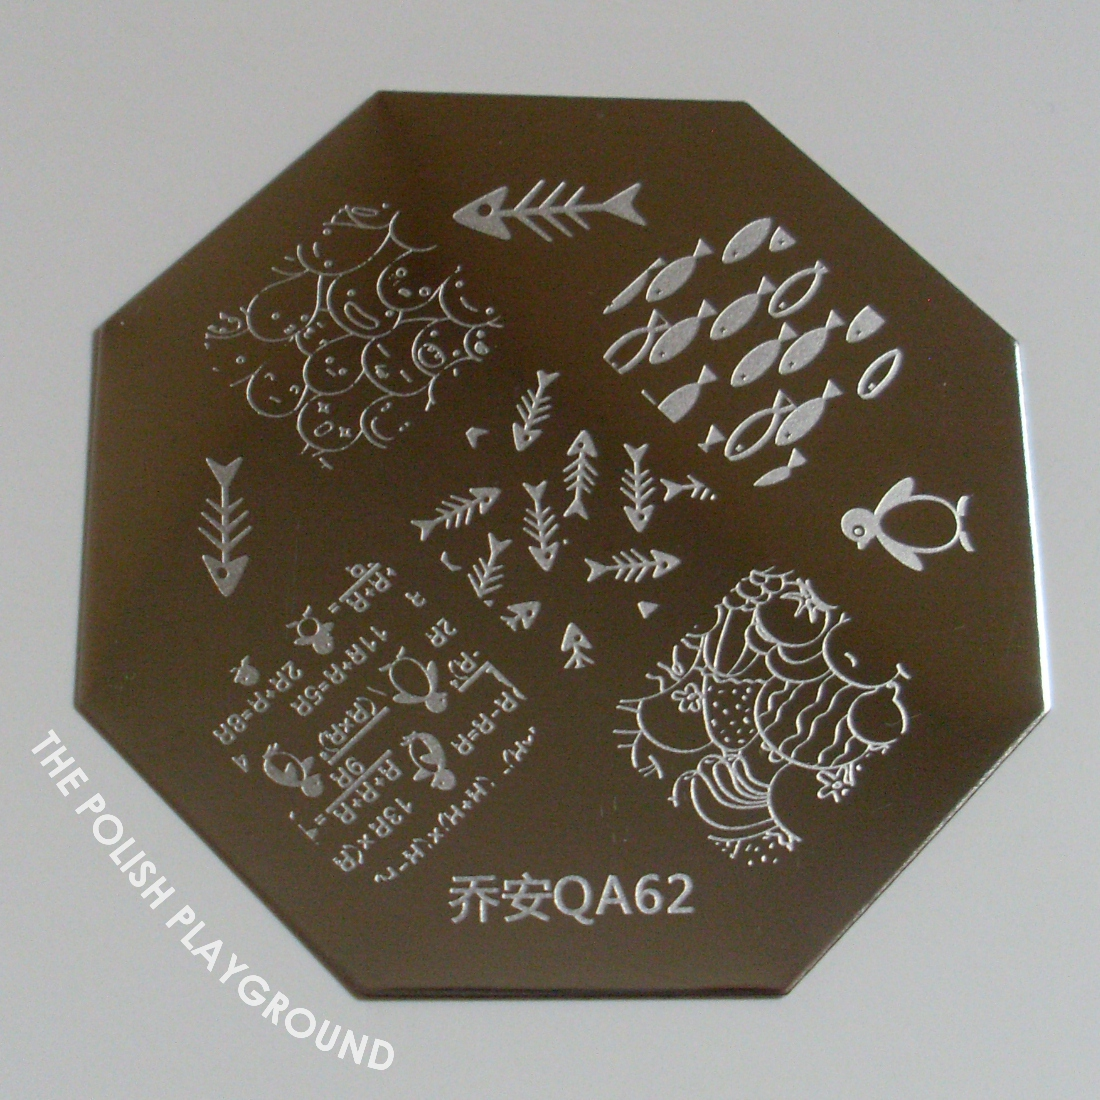 Born Pretty Store QA62 Nail Stamping Plate